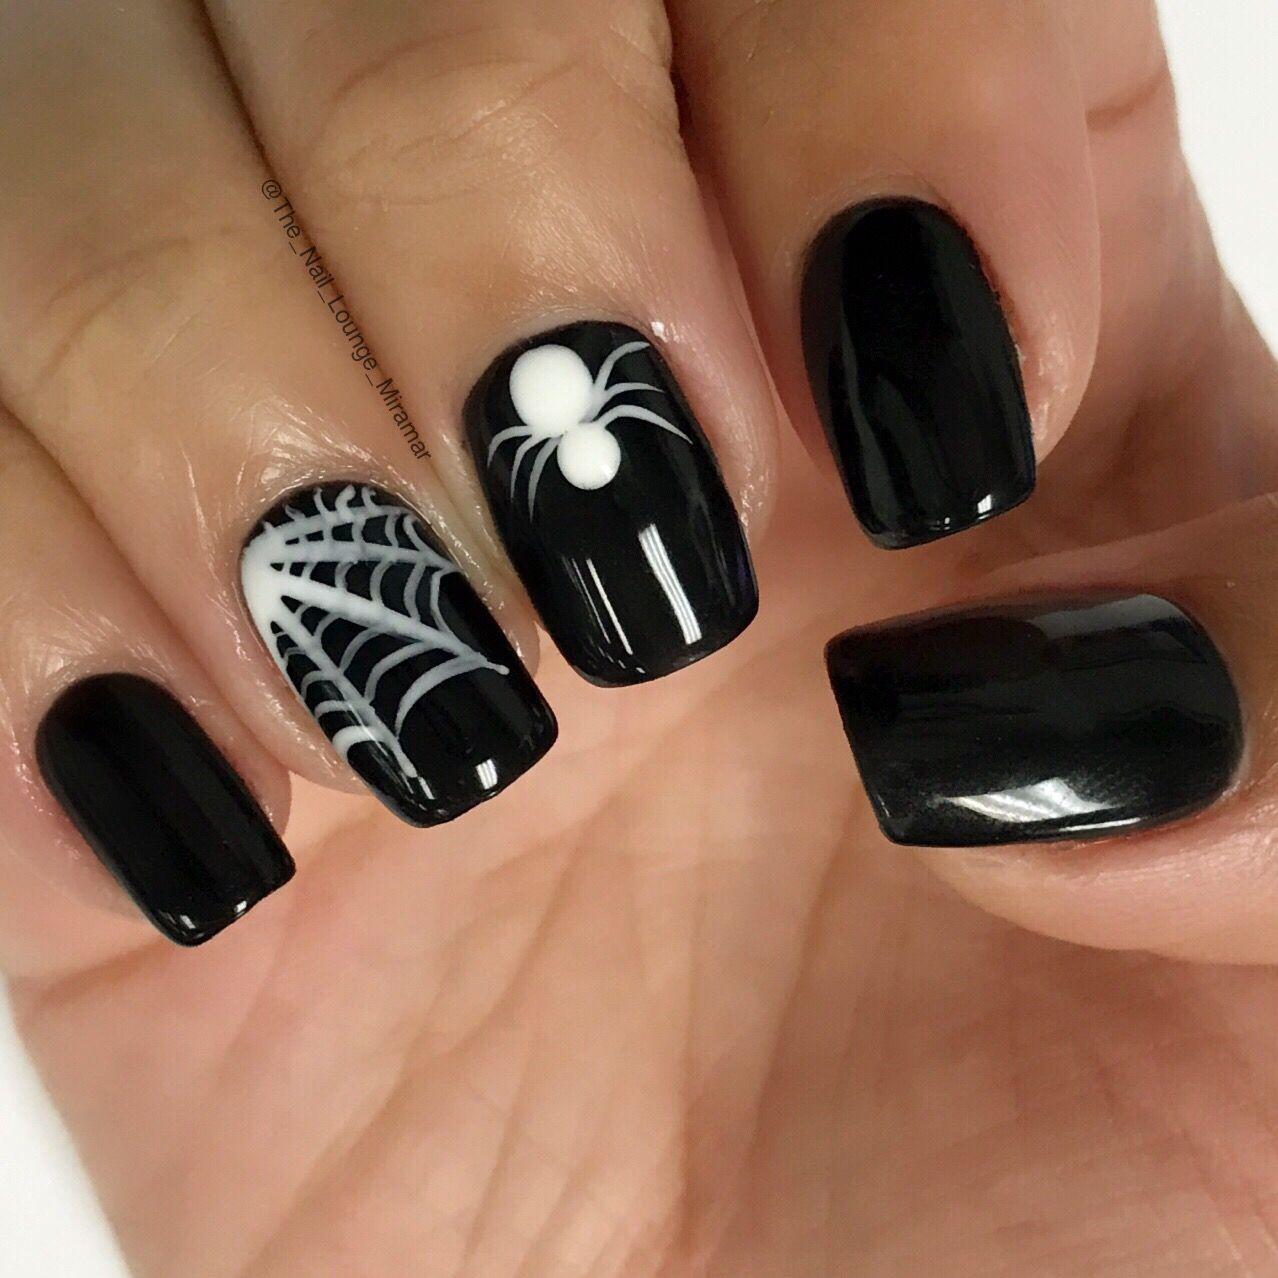 Spiderweb Halloween nail art design | Nail Art | Pinterest ...